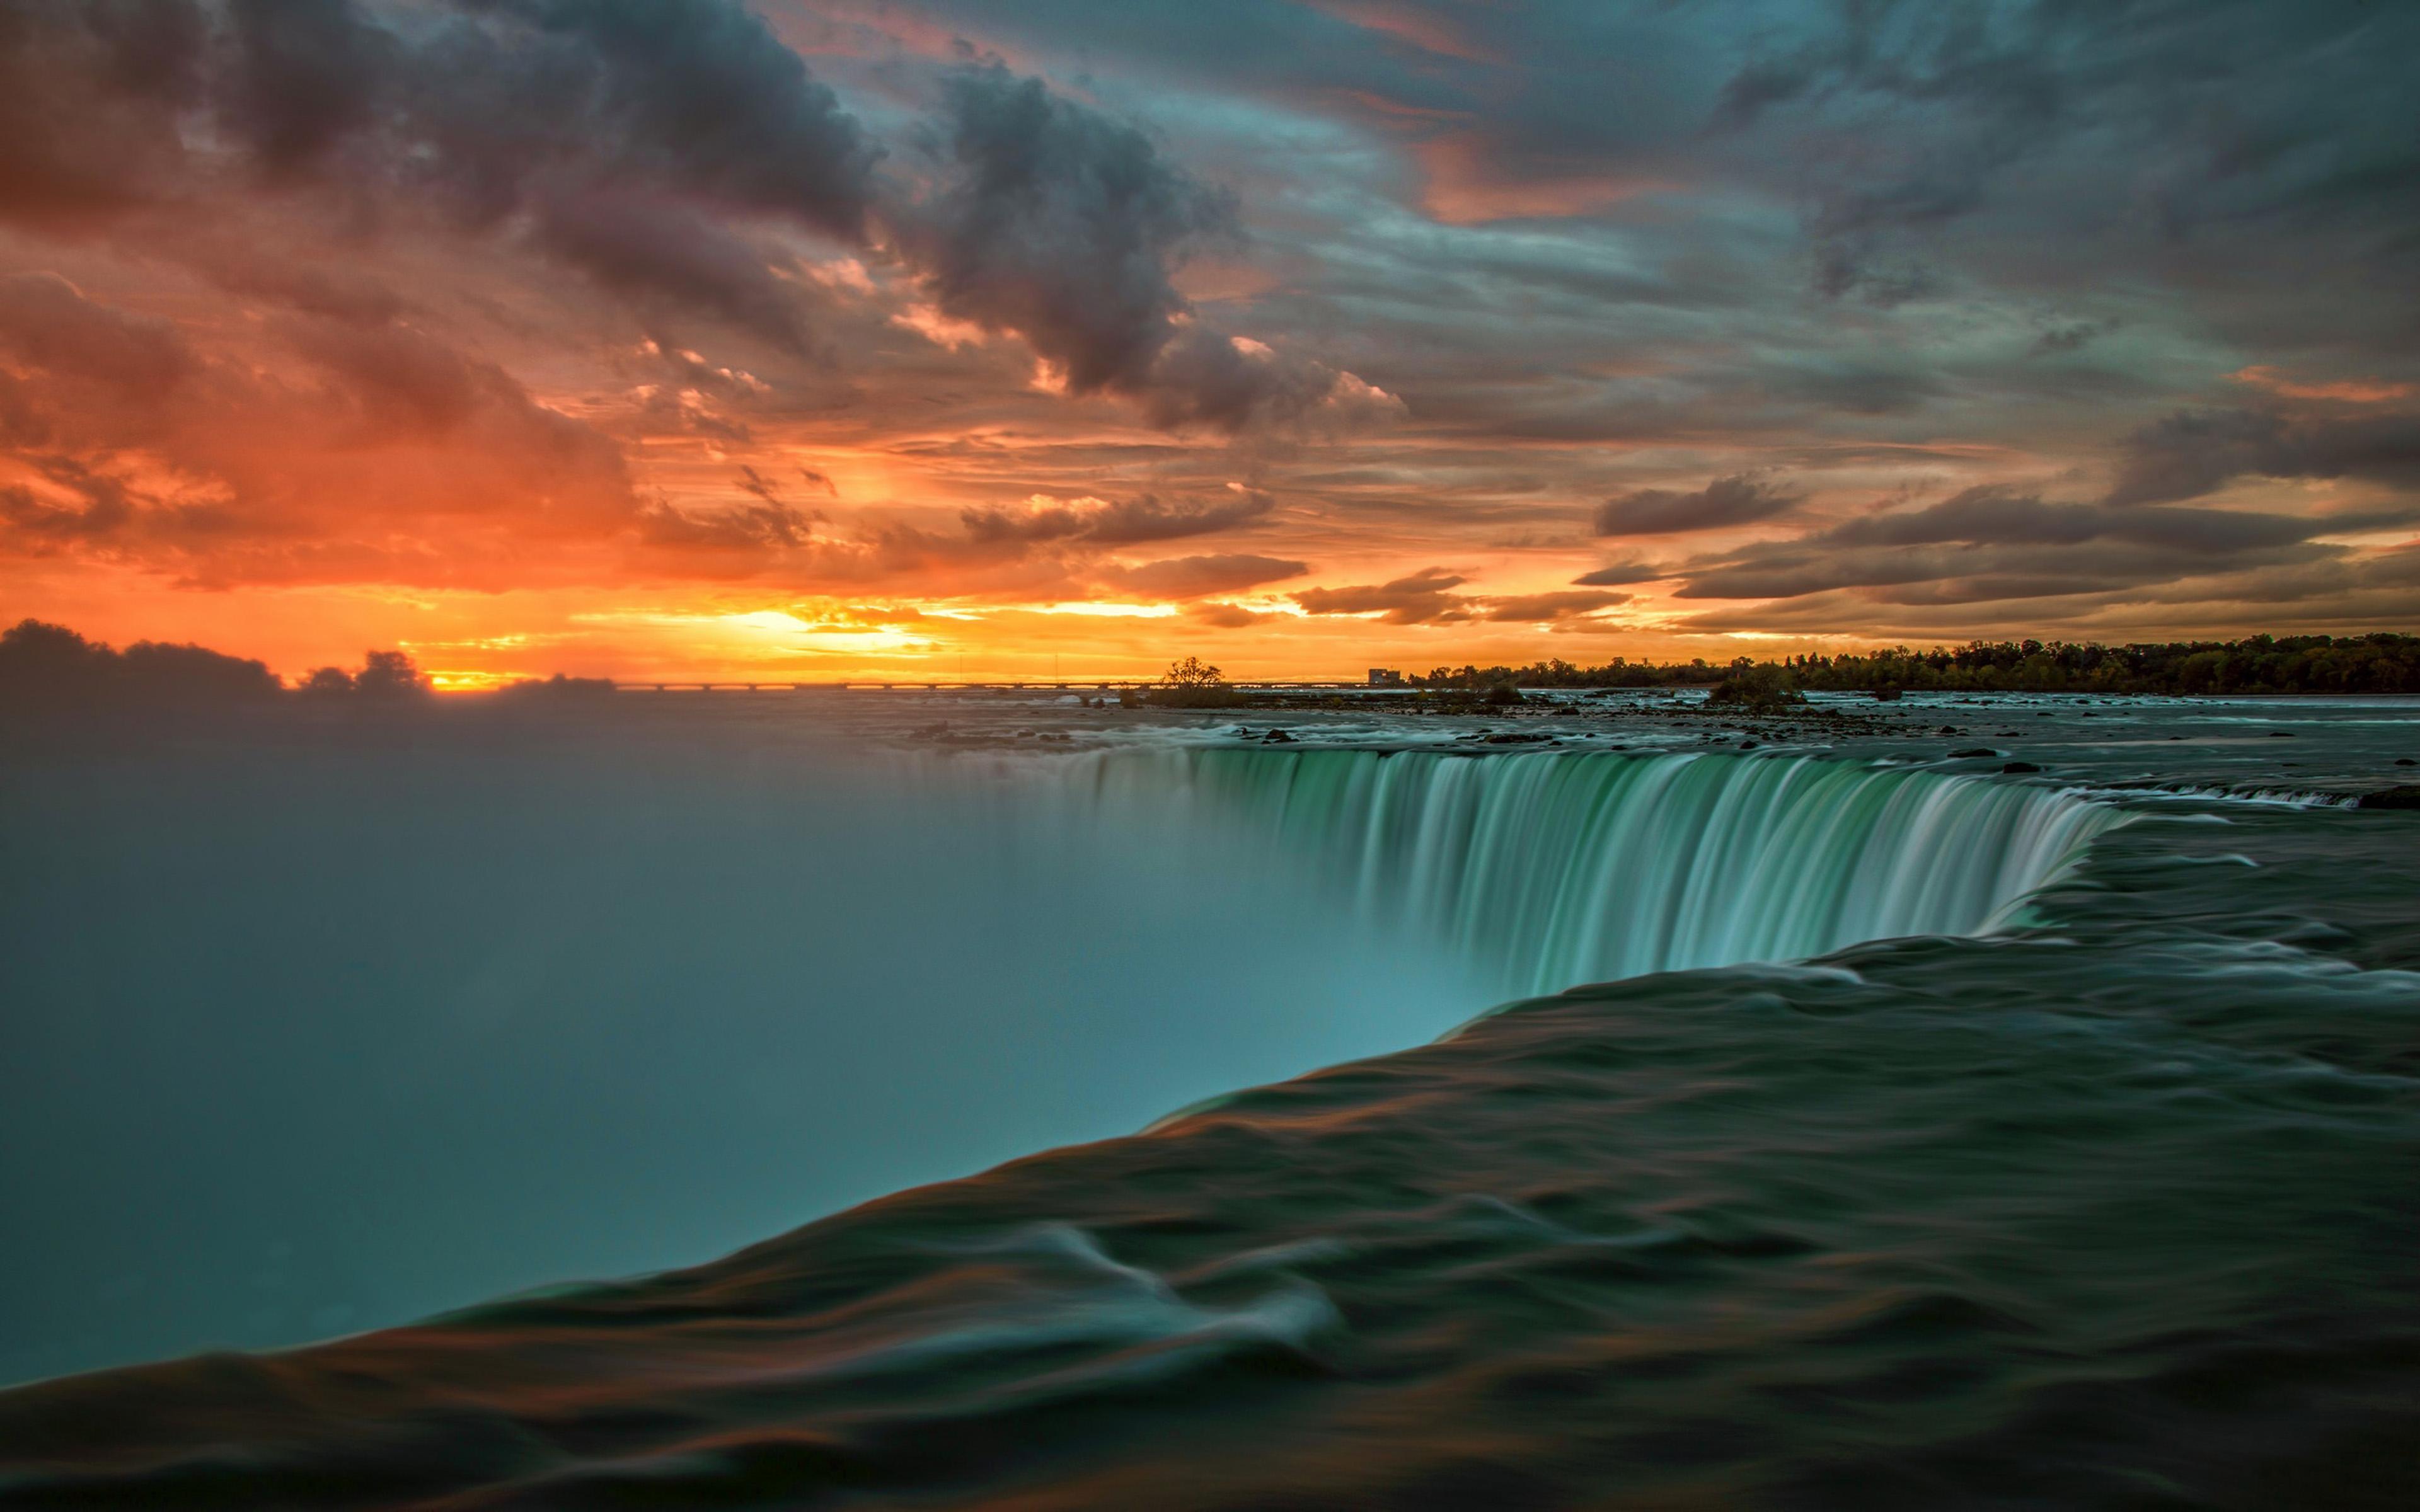 Niagara Falls Wallpaper 1366x768 Niagara Falls In Canada Sunset Landscape Nature 4k Ultra